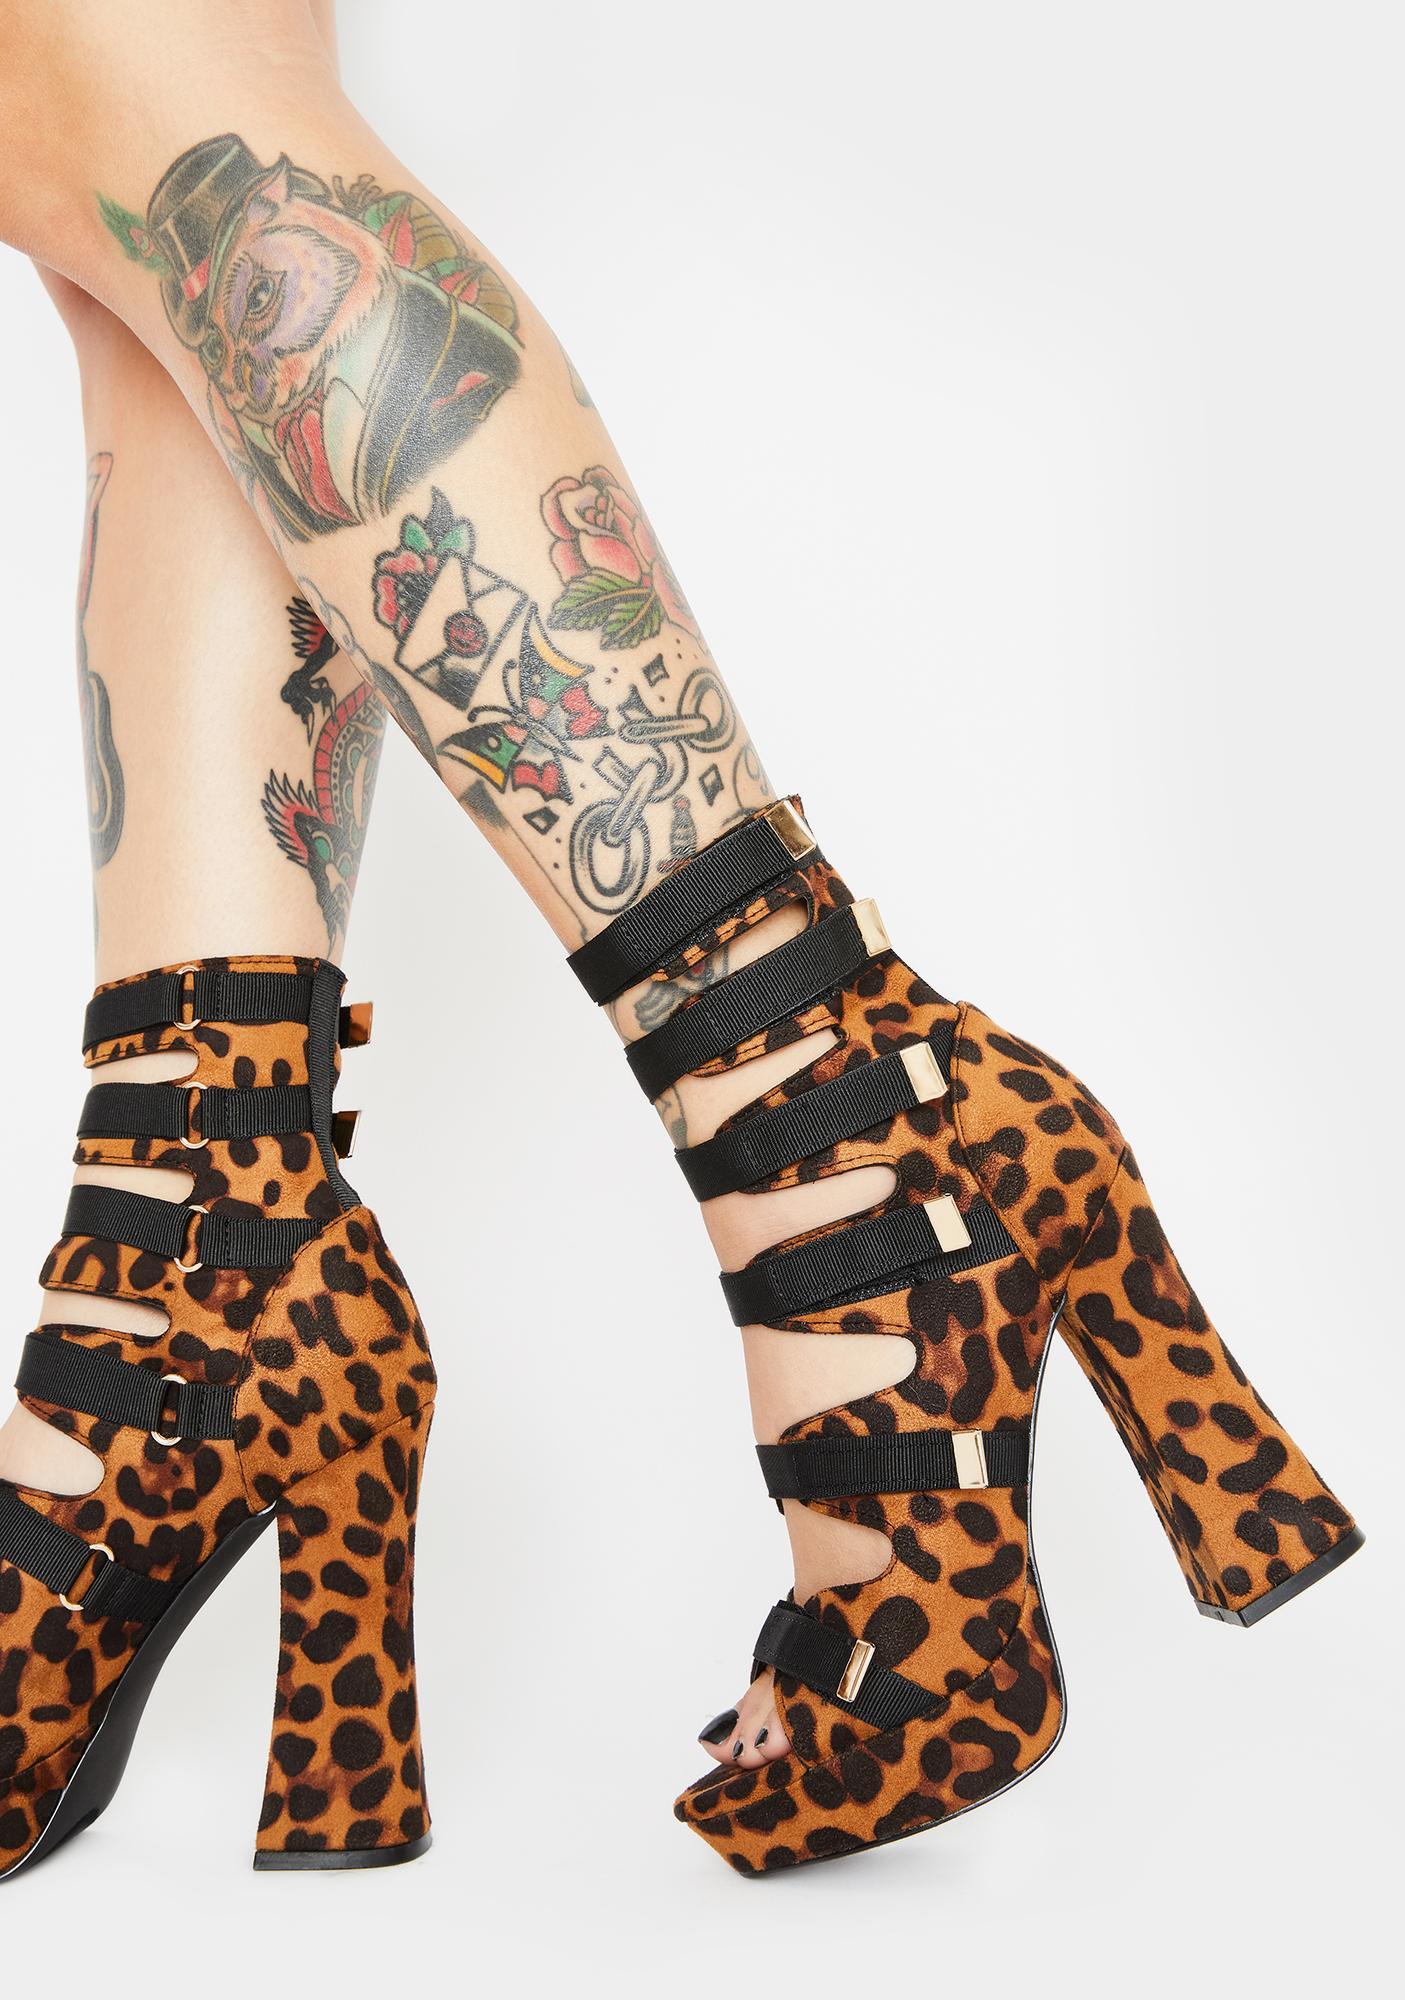 Catty Strap And Scrap Platform Heels